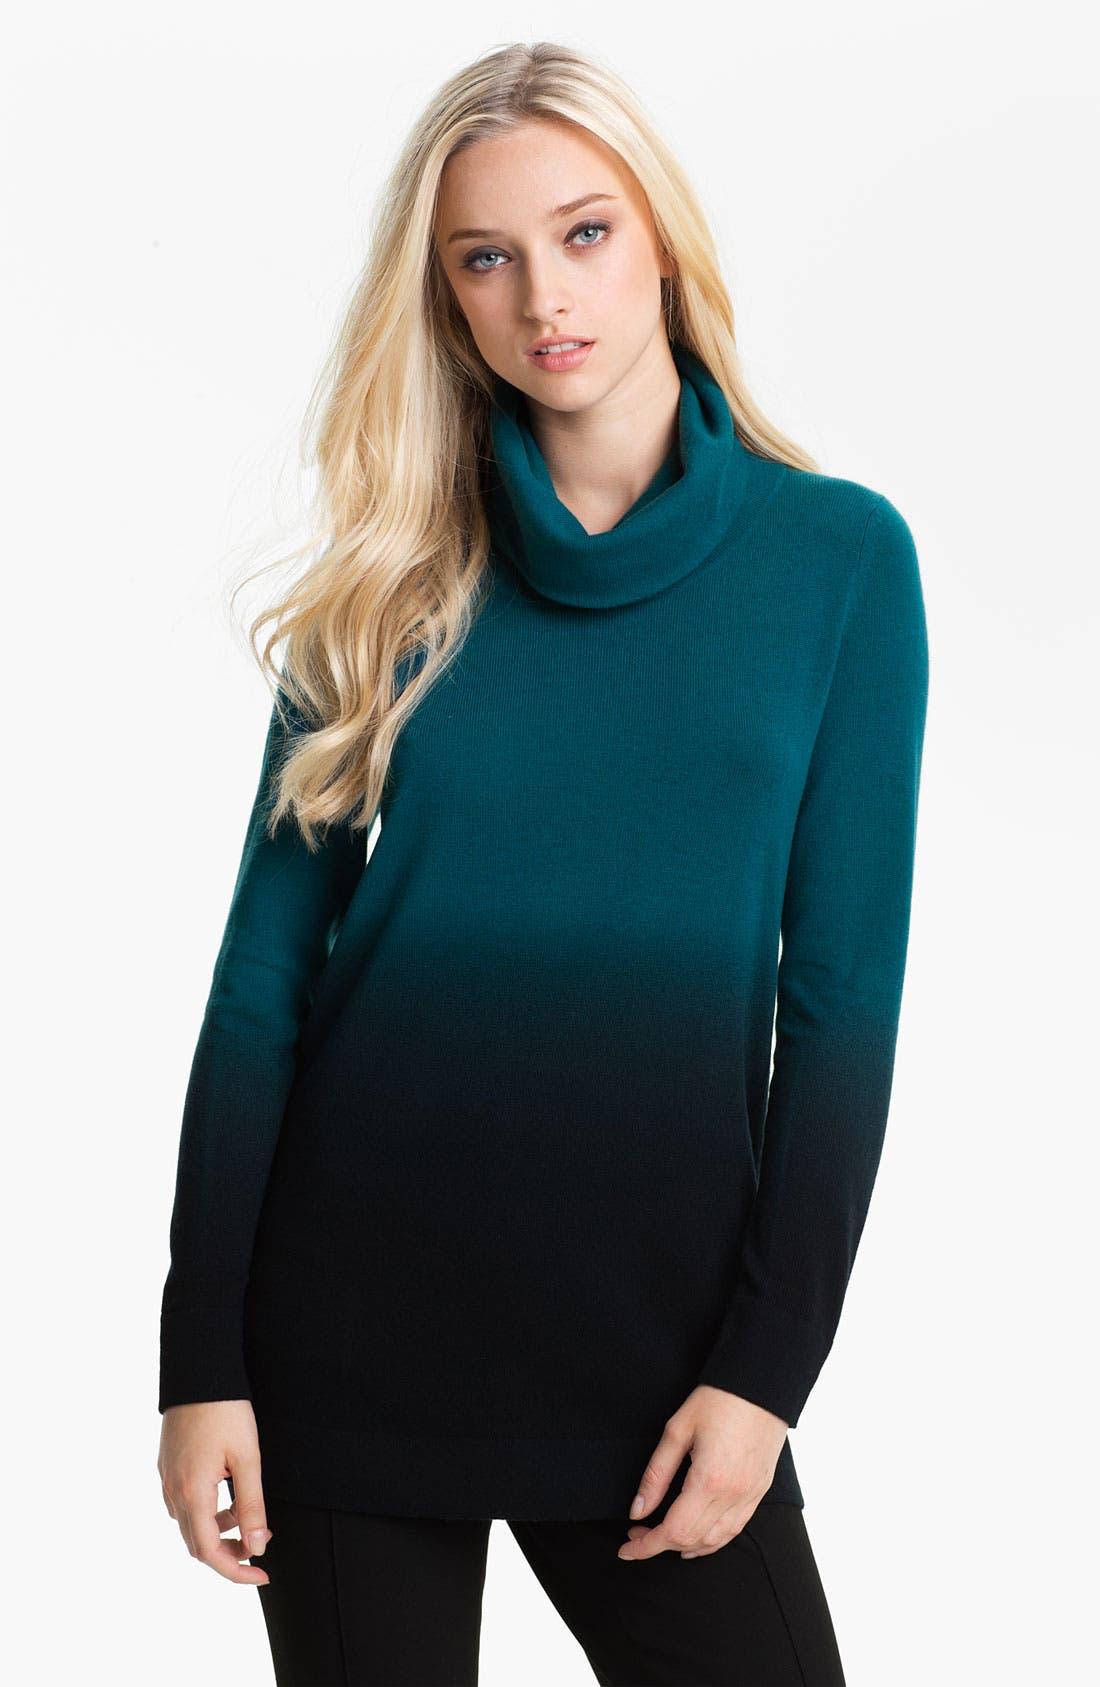 Alternate Image 1 Selected - Nordstrom Collection Ombré Cashmere Turtleneck Sweater